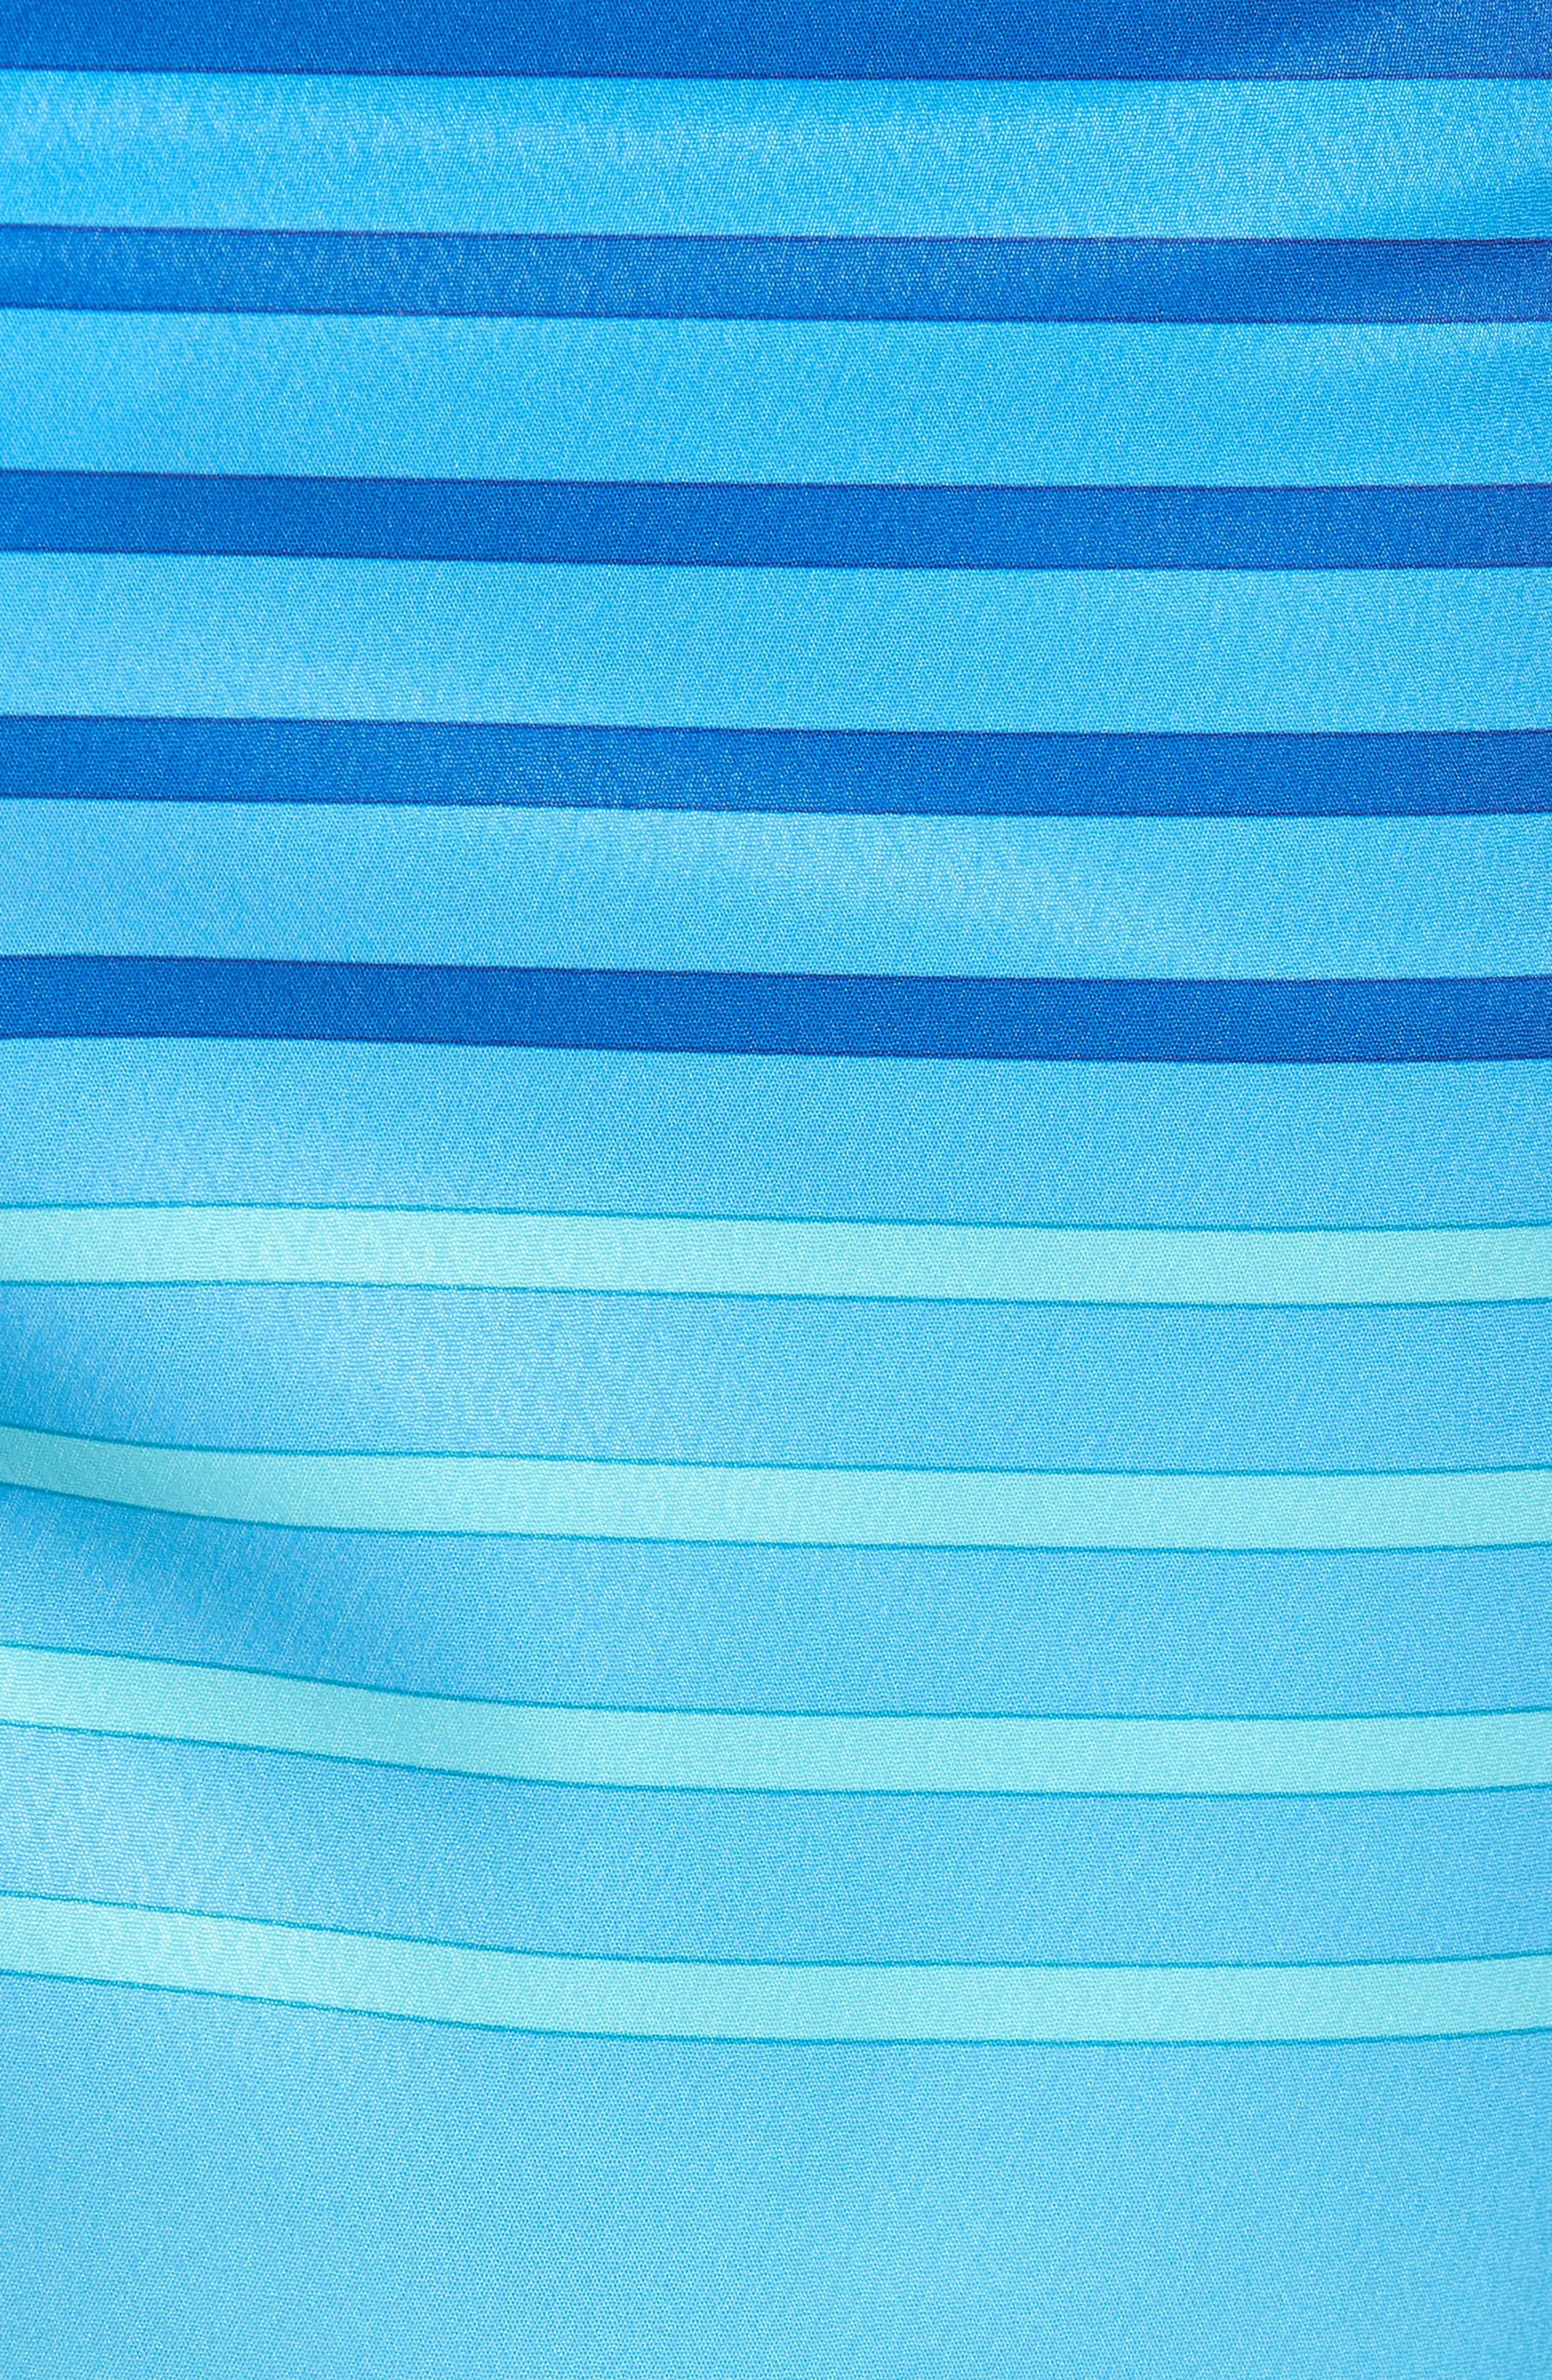 Surflodge Stripe Board Shorts,                             Alternate thumbnail 5, color,                             359